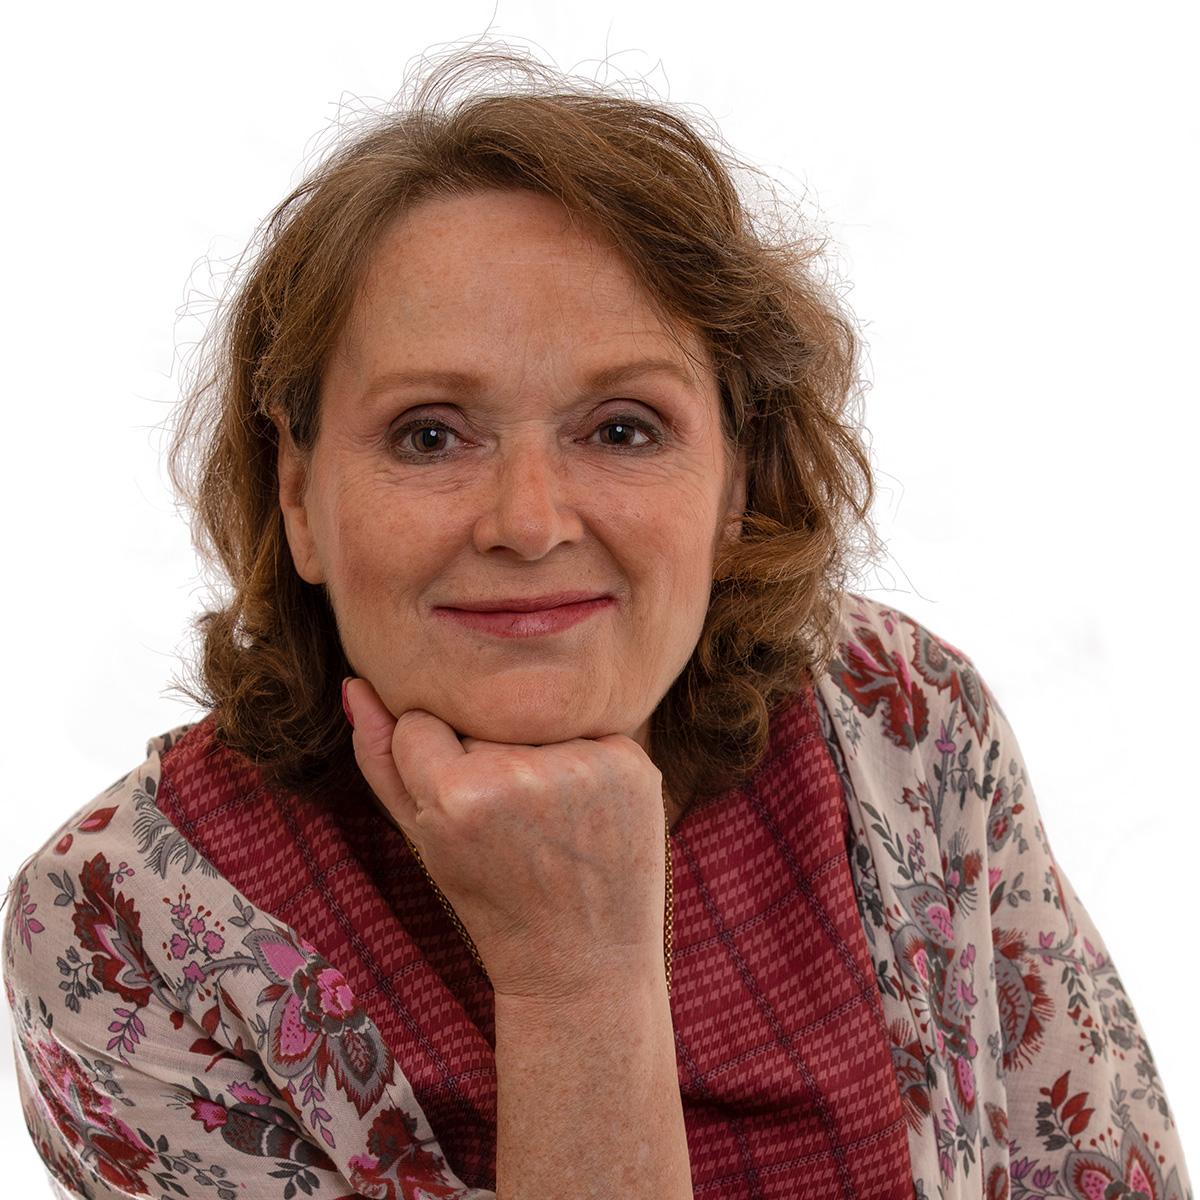 Wer ist Ulrike Funk-Gerstel?